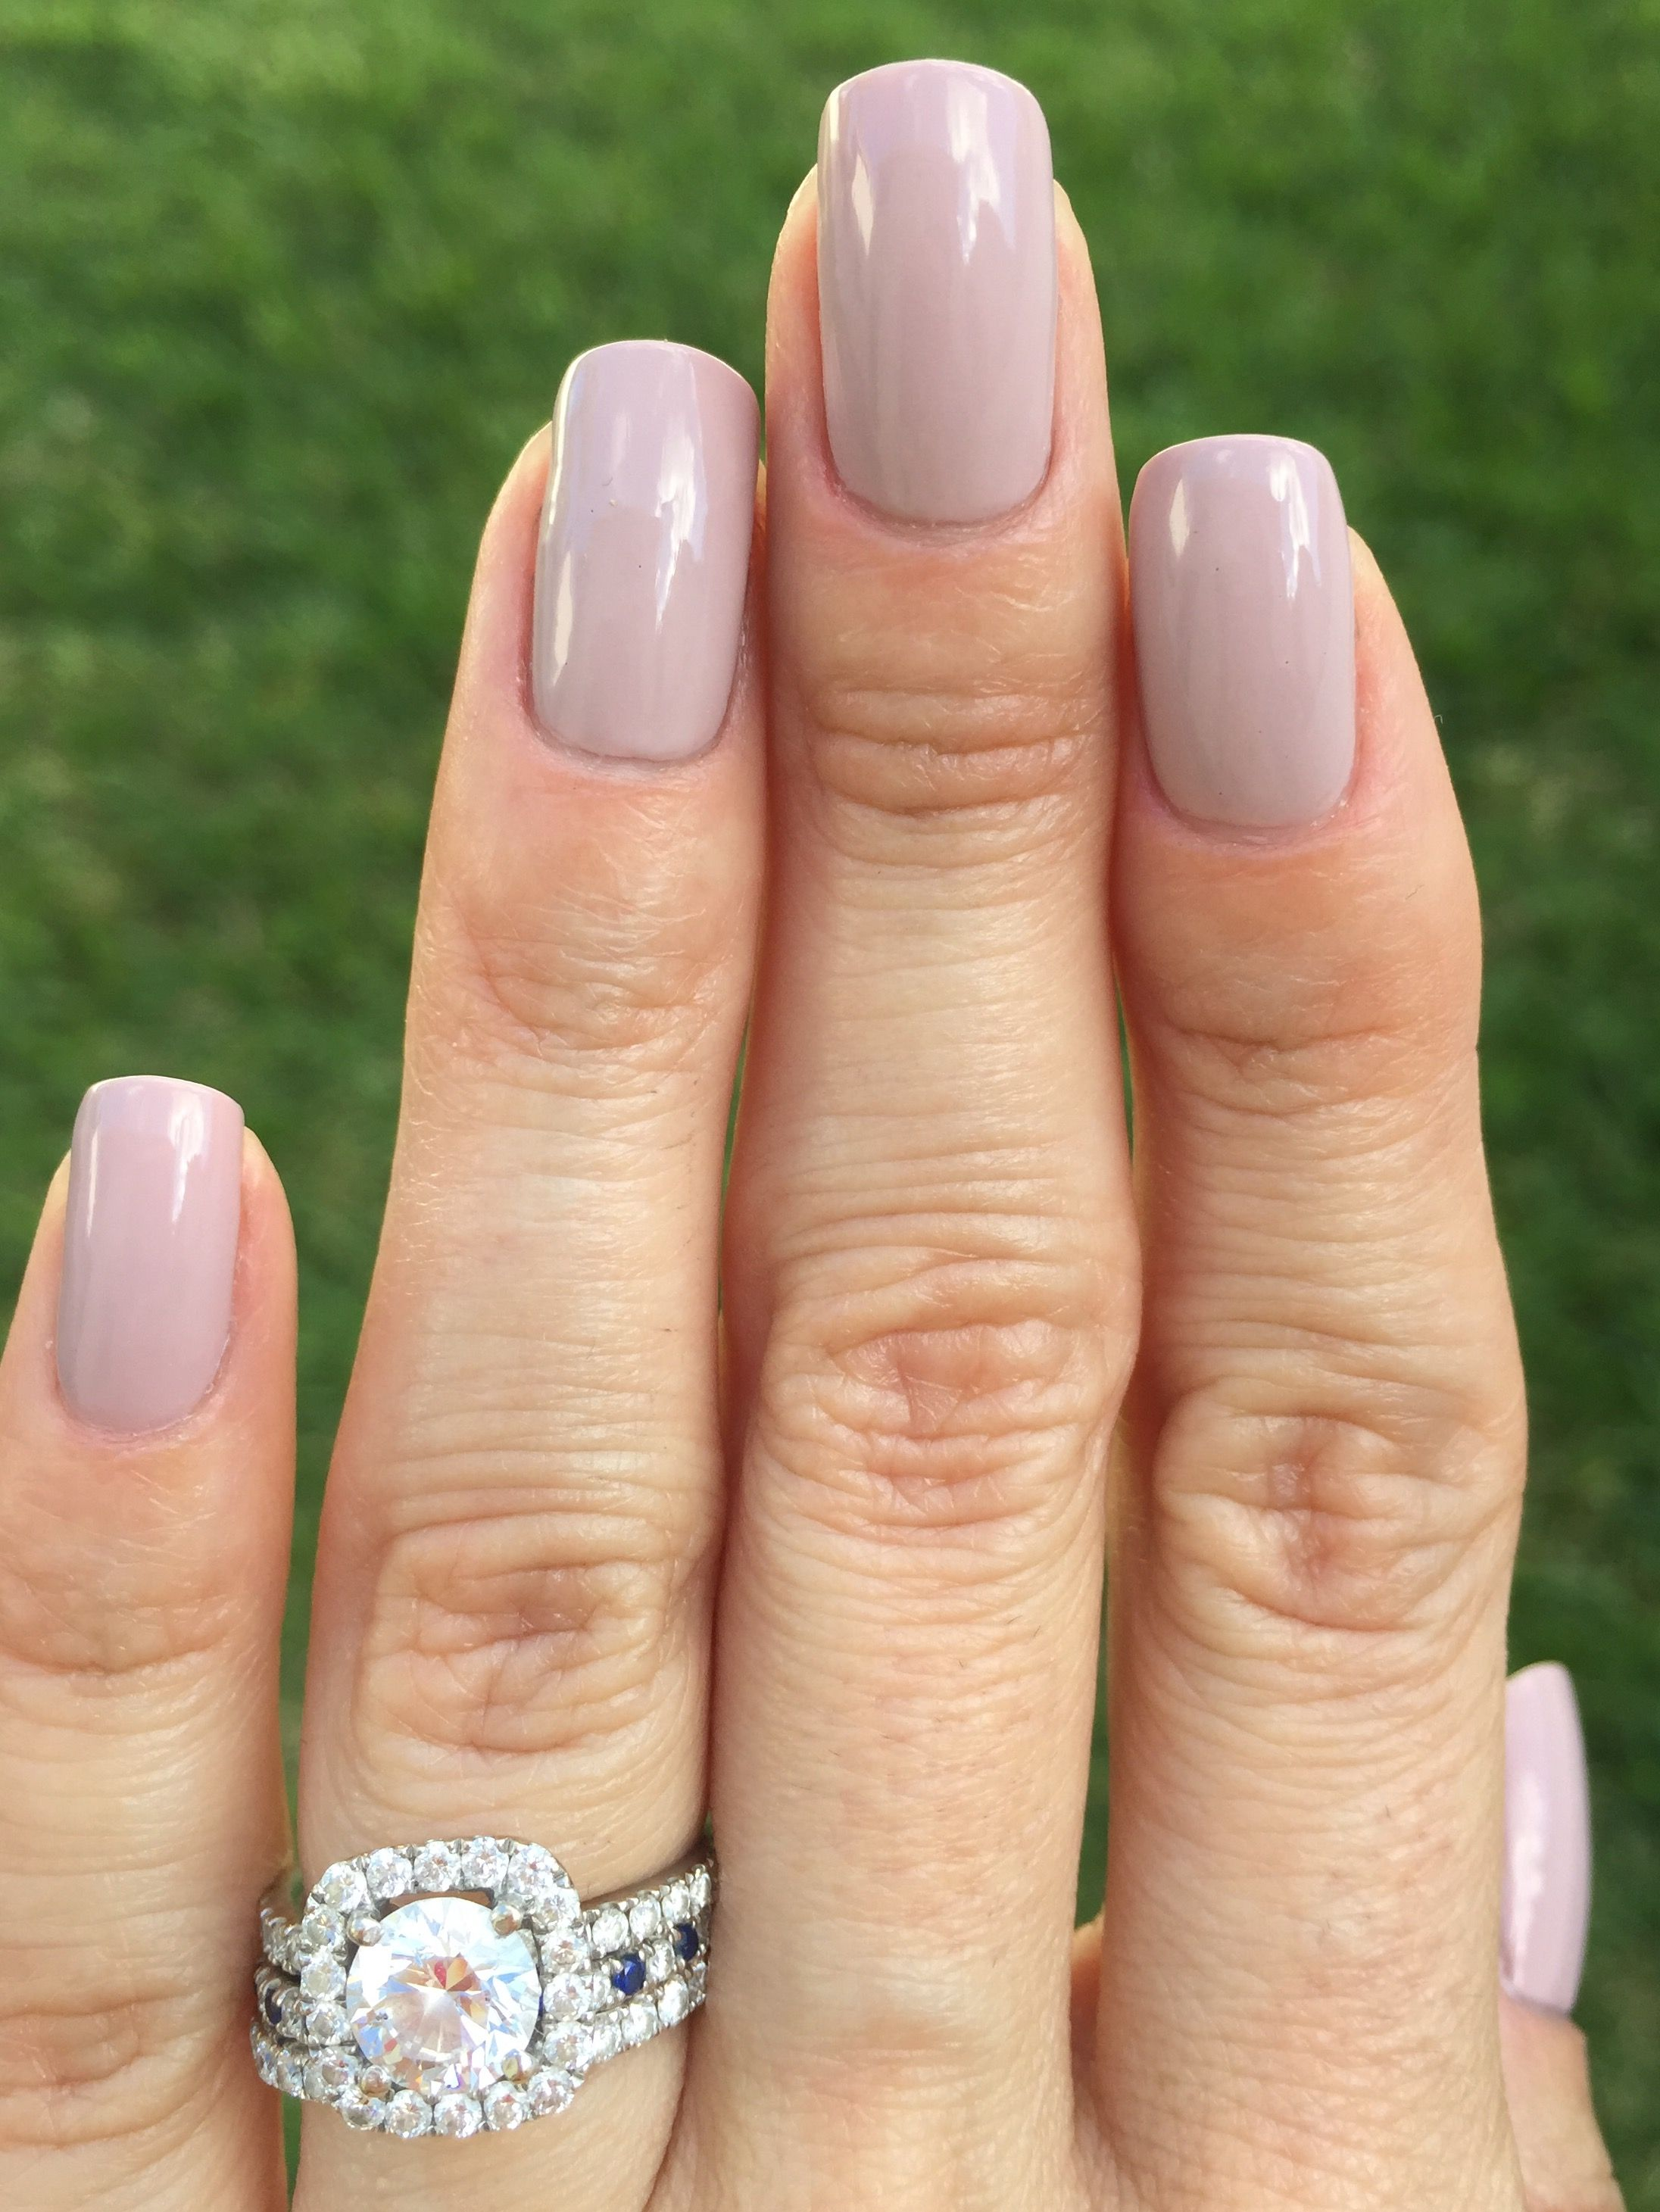 Essie - Go Go Geisha - light purple mauve nails - neutral manicure ...